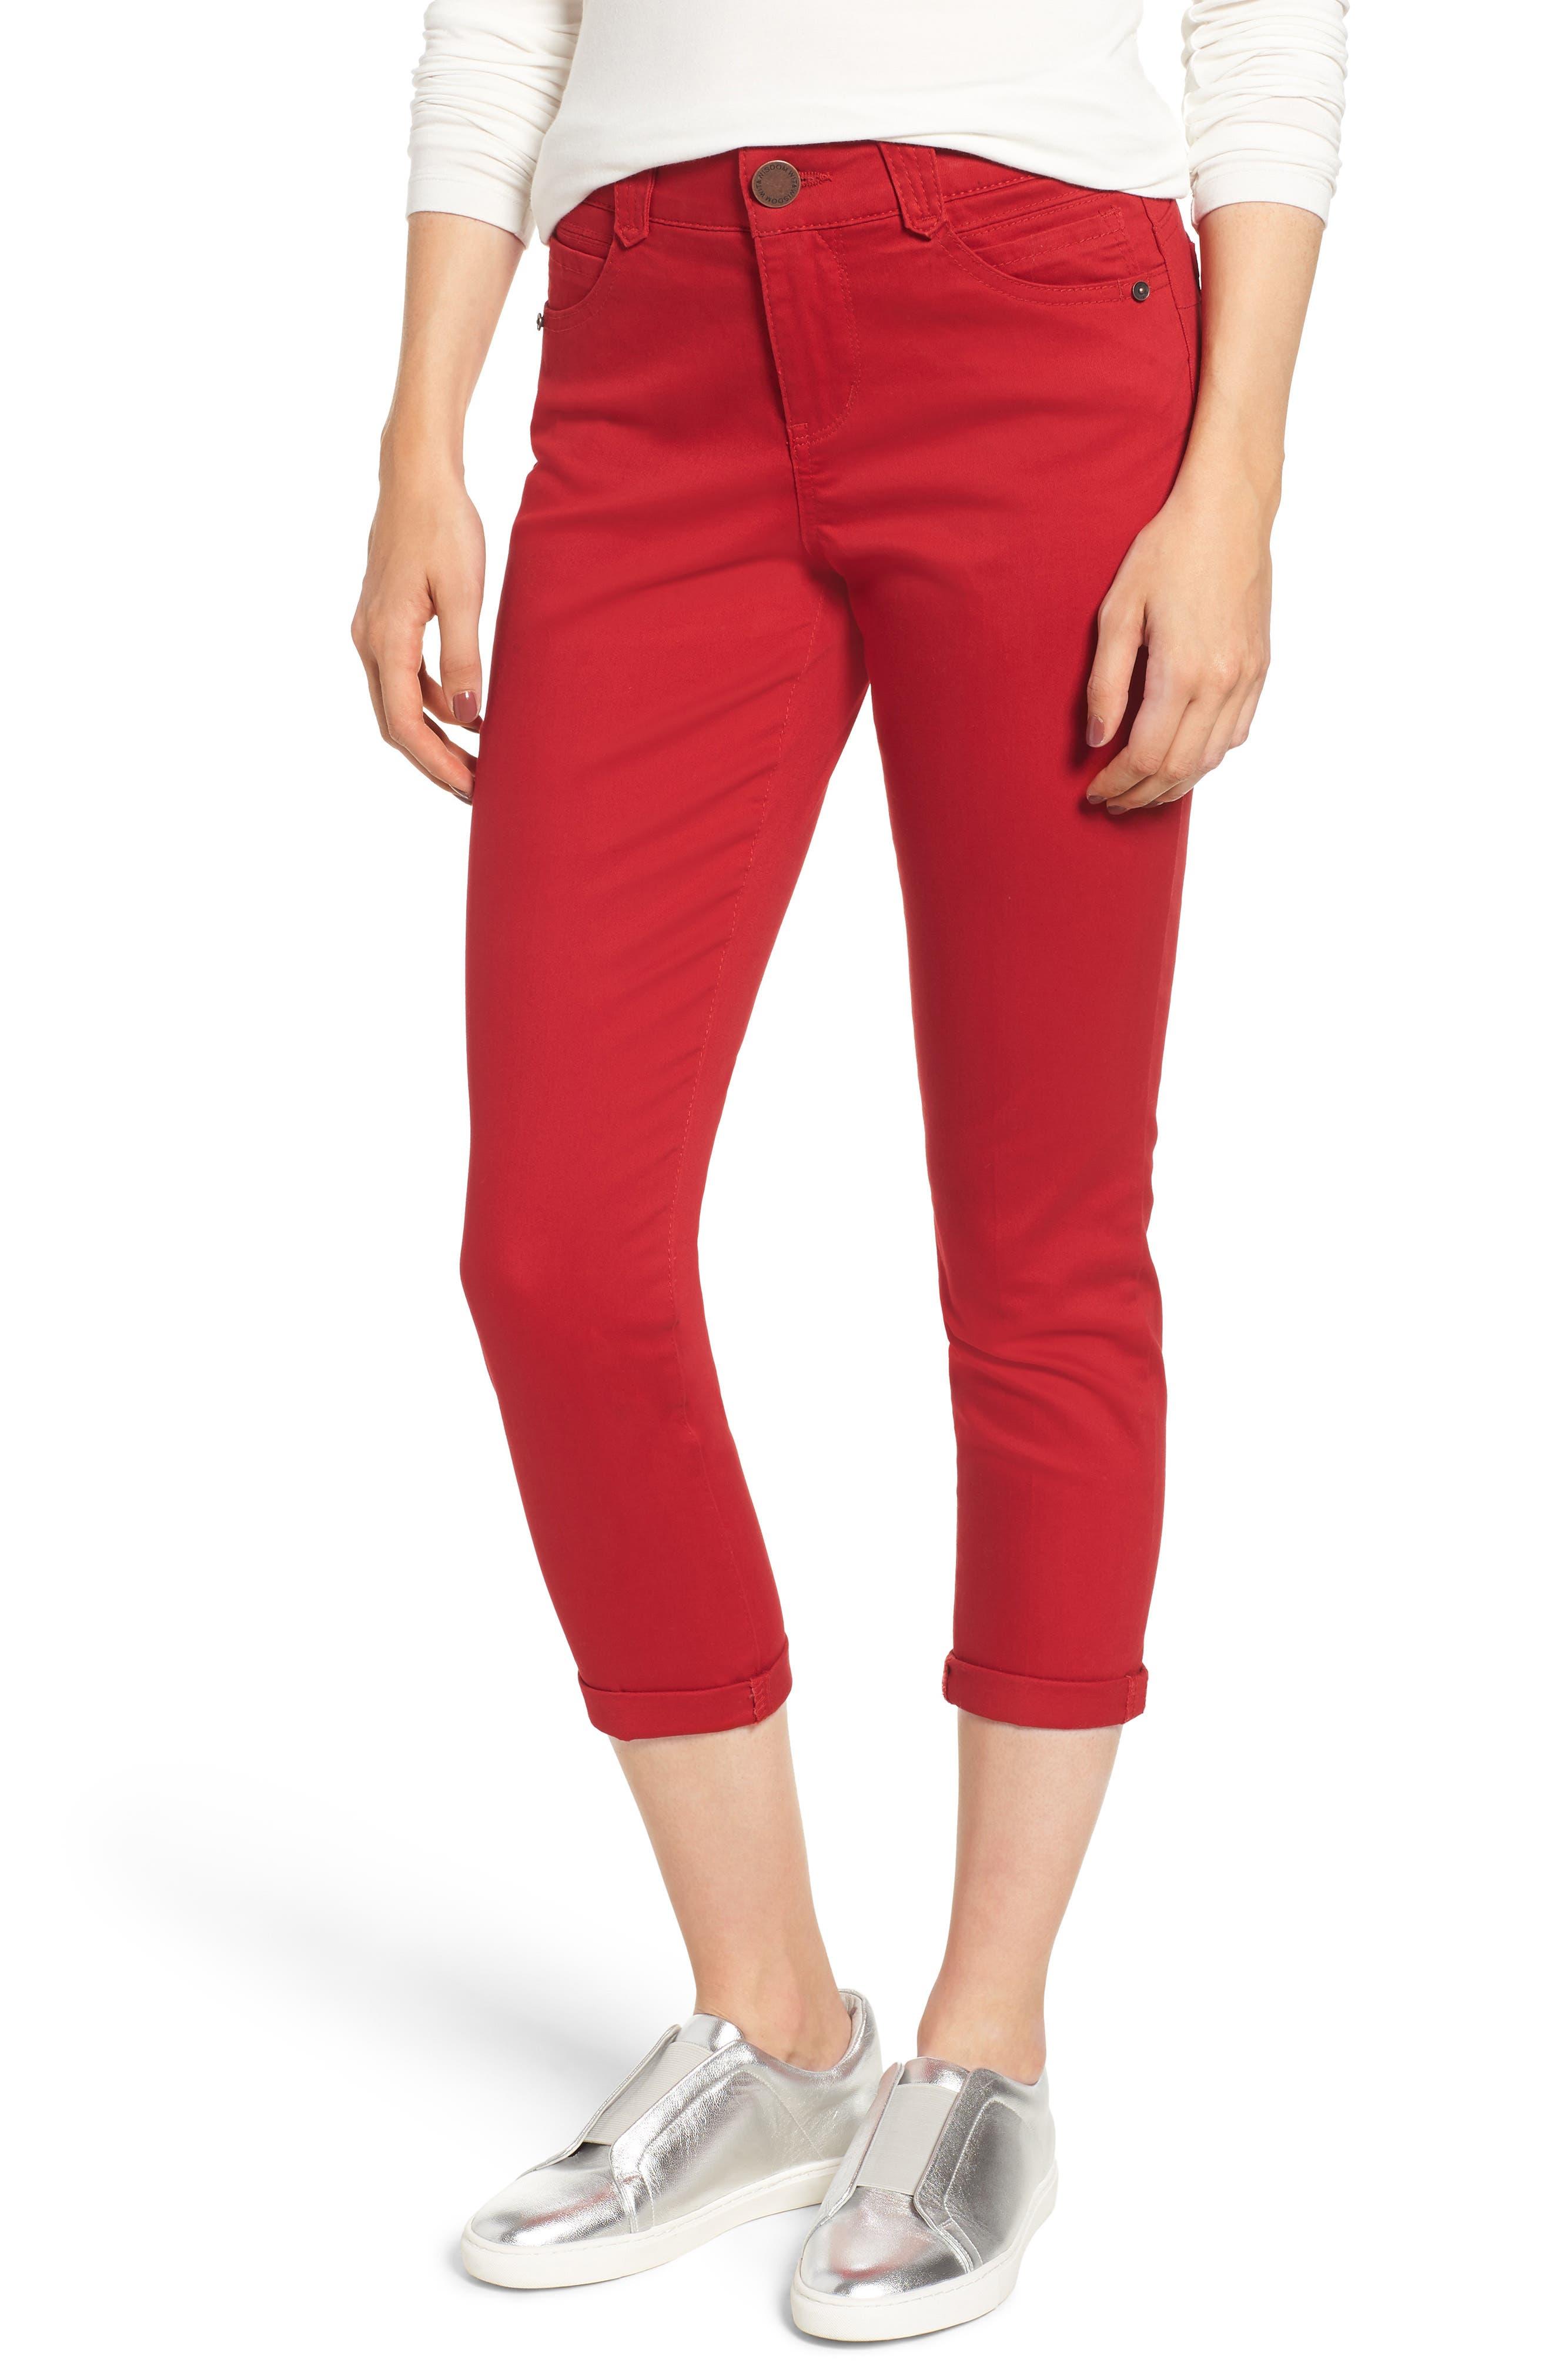 Nordstrom Pants Leggings amp; Pants amp; Women's Nordstrom Women's Leggings Pants amp; Women's qxH4PWtw